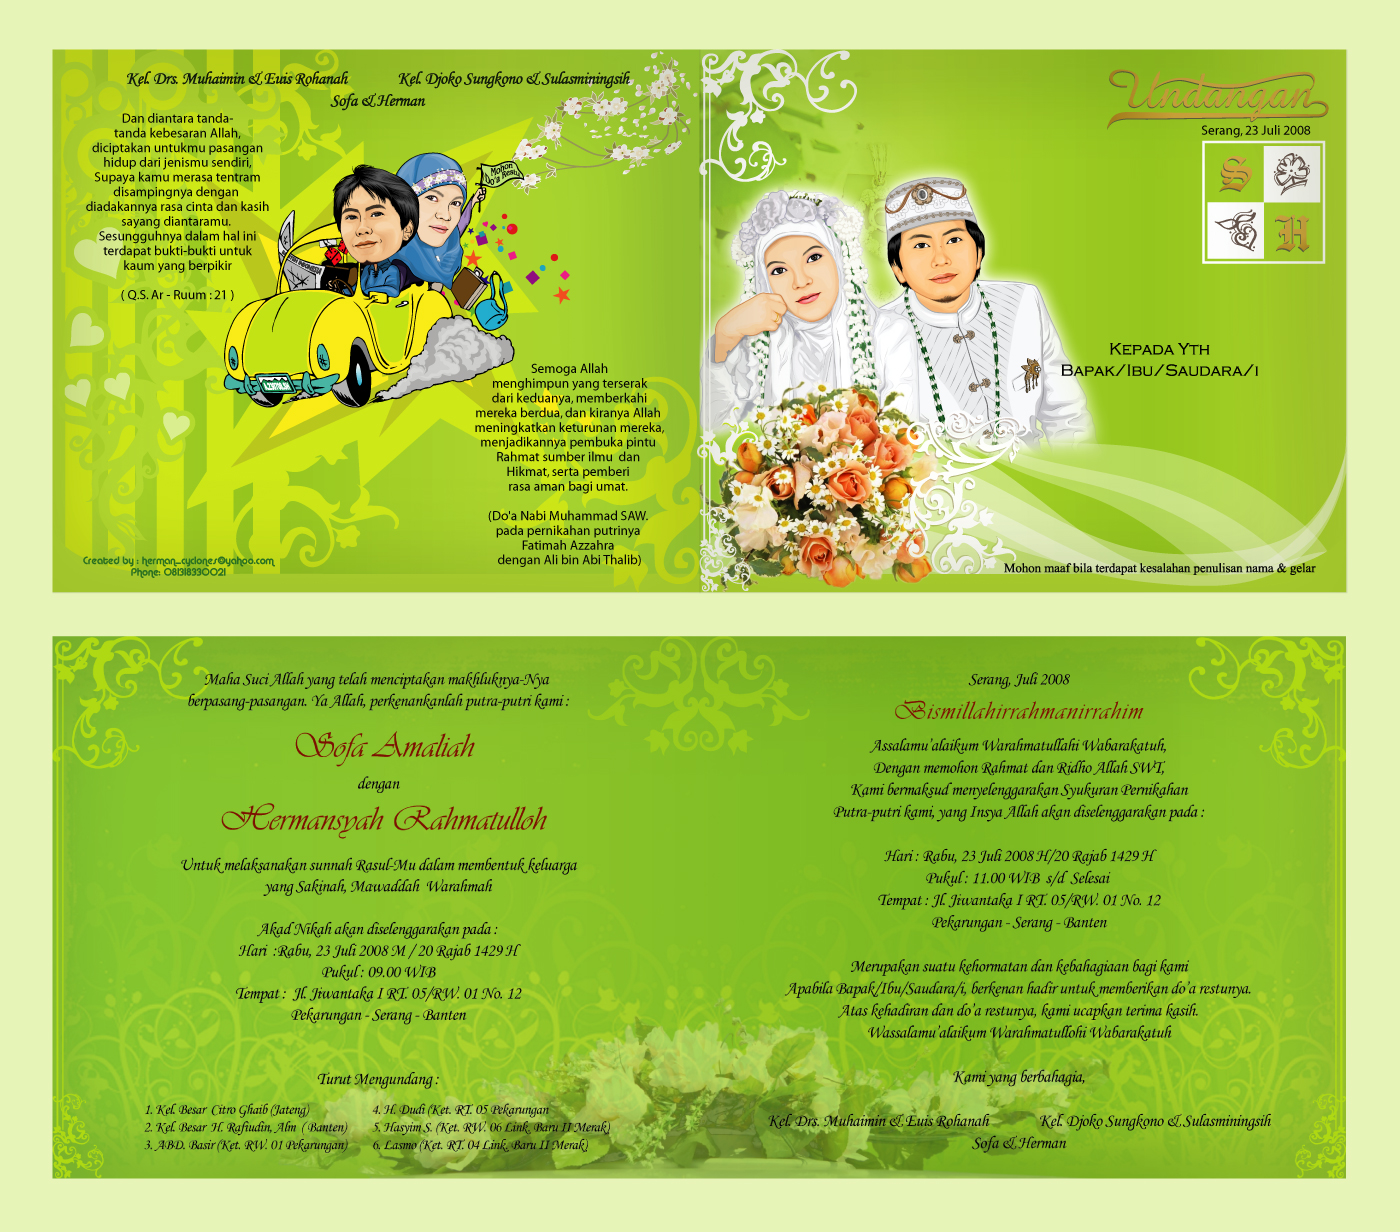 MEGA OFFSET) cetak undangan, brosur, poster, flyer, kop surat murah